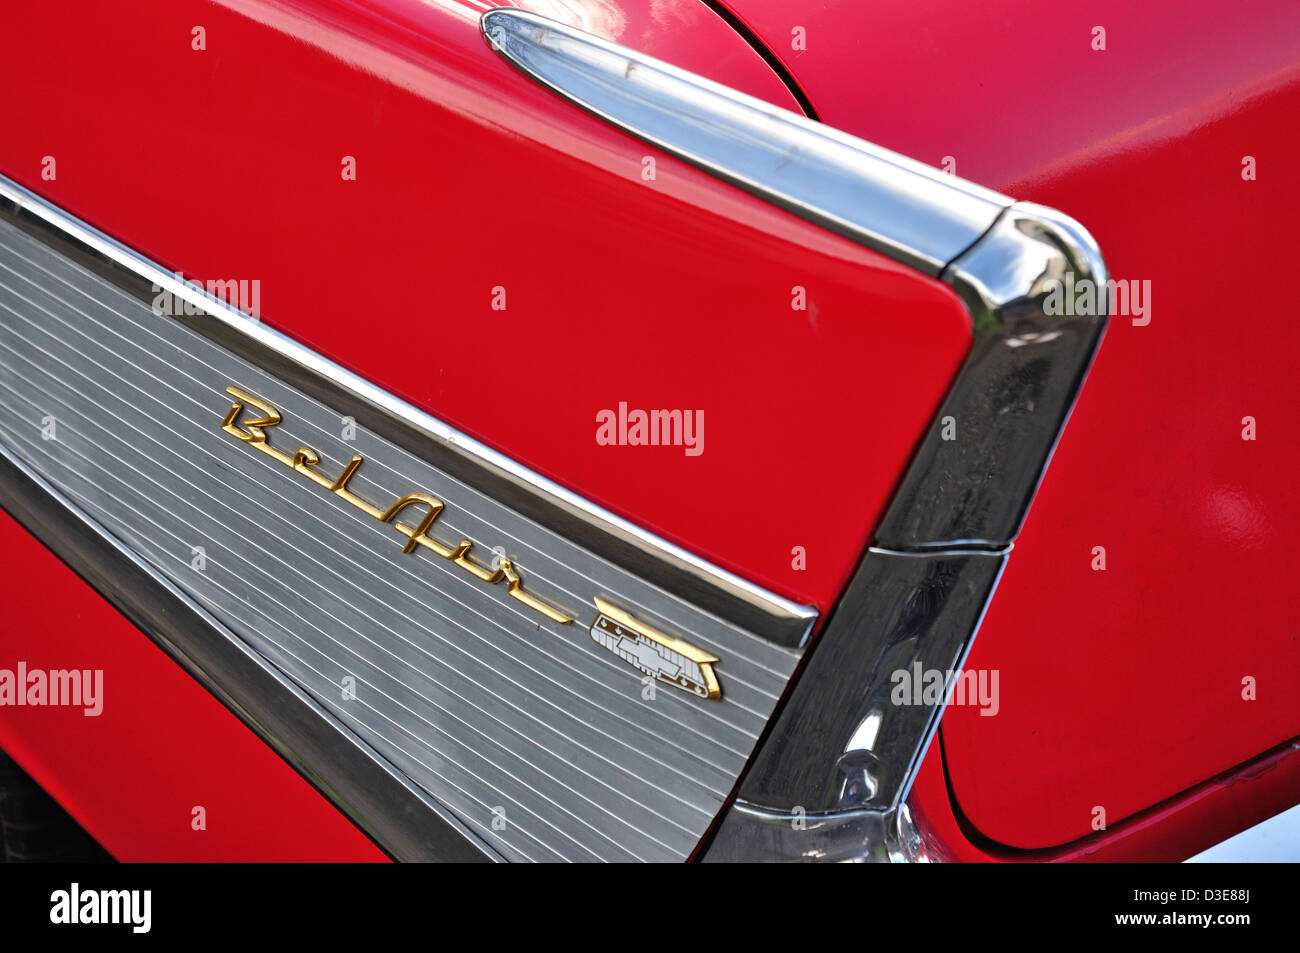 Detalle del ala Classic 1957 Chevrolet Bel Air Sedan, Stanwell Moor, Borough of Spelthorne, Surrey, Inglaterra, Imagen De Stock